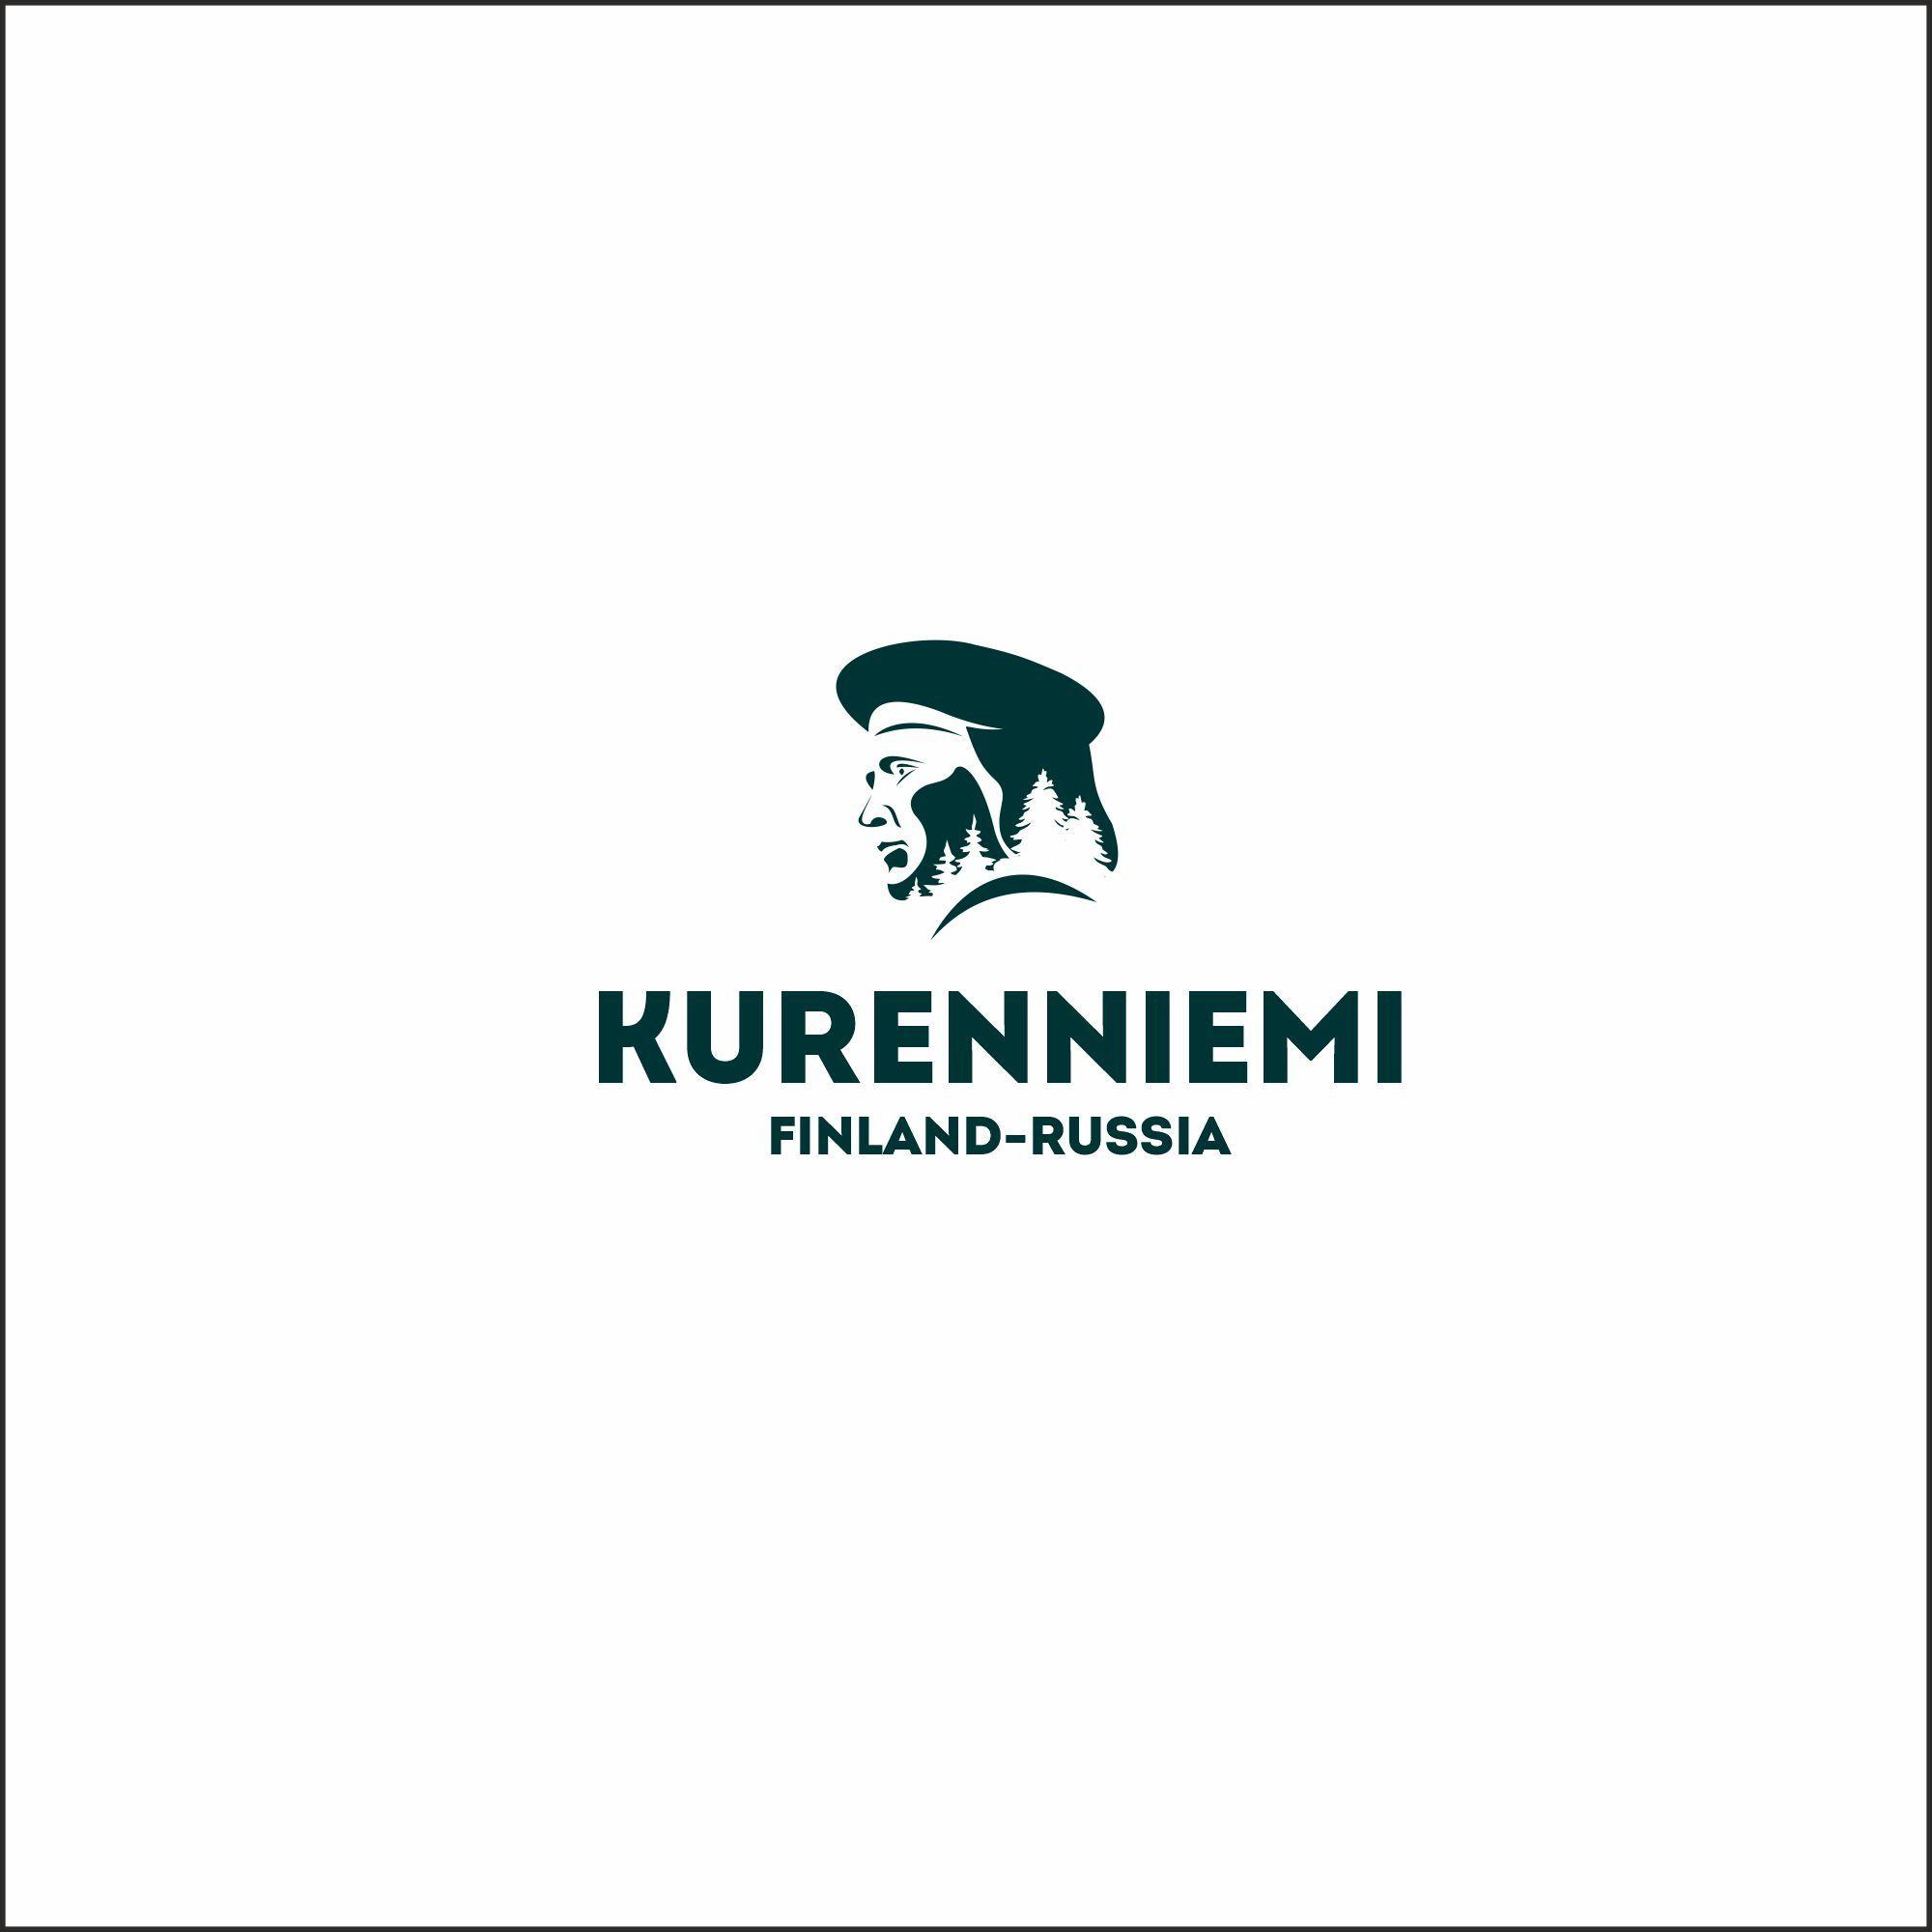 Логотип для Kurenniemi, FinAgRu-nat, Finland-Russia - дизайнер salik